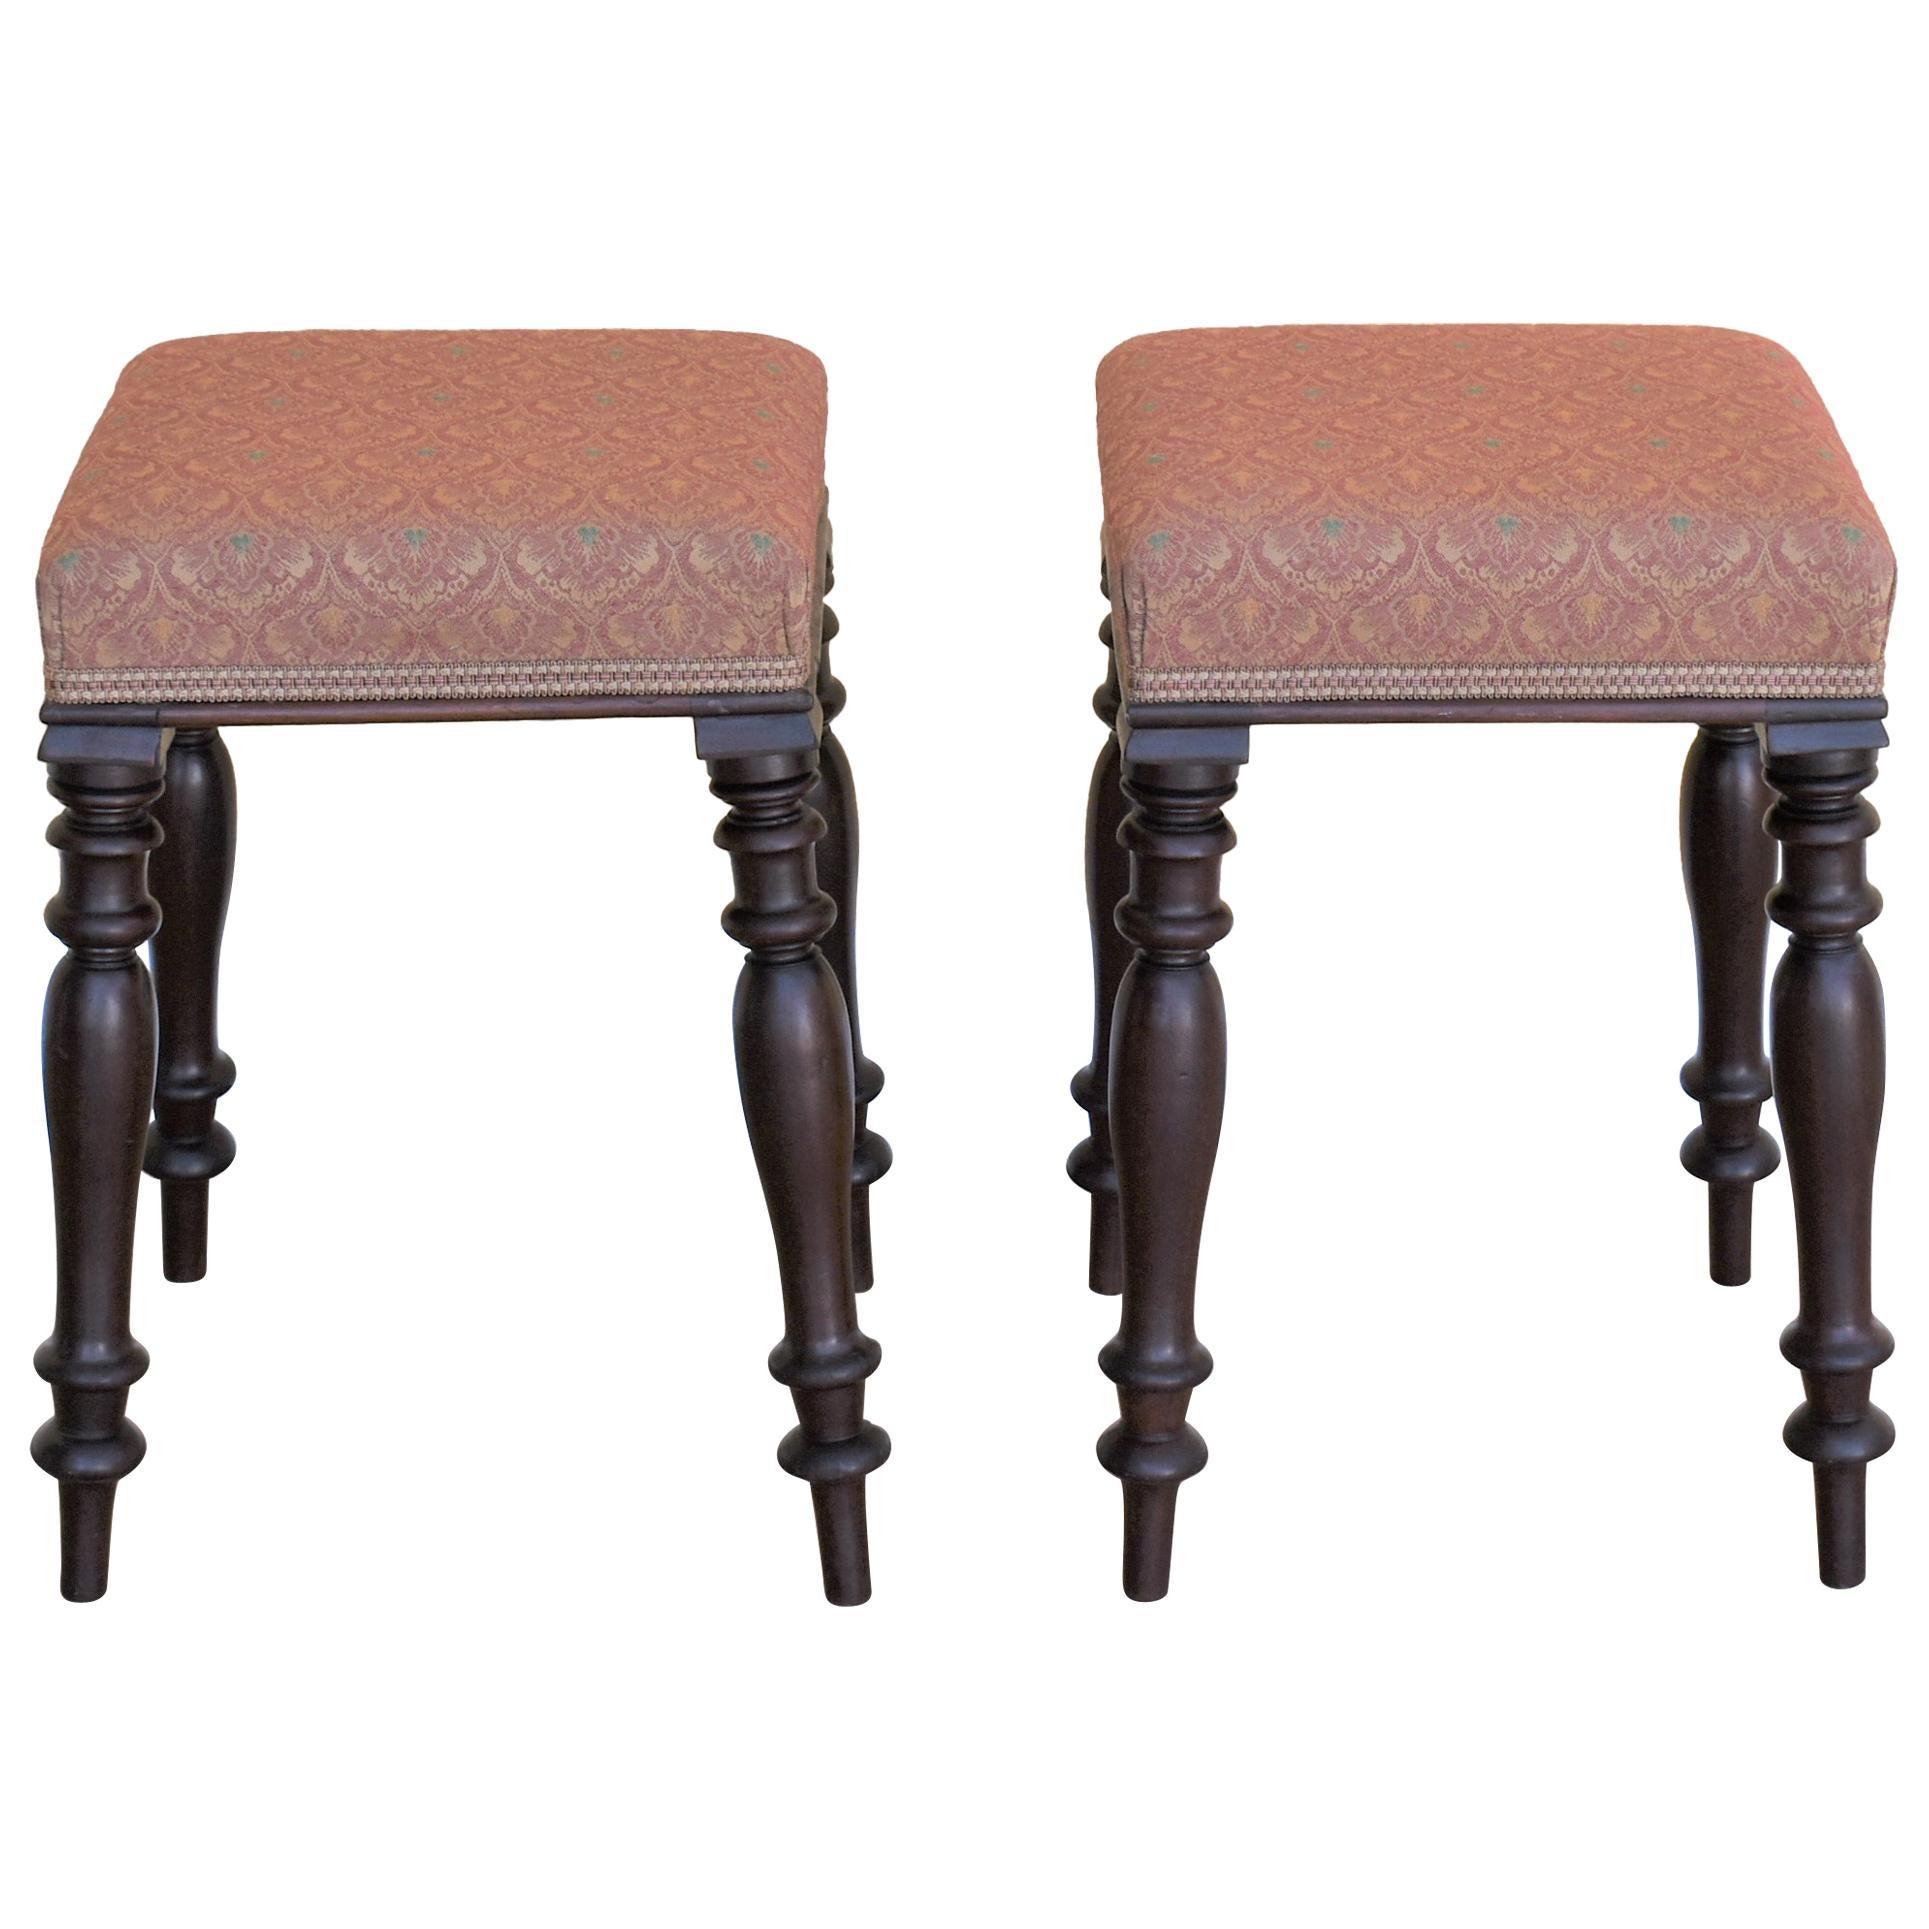 Pair of Victorian Mahogany Upholstered Stools